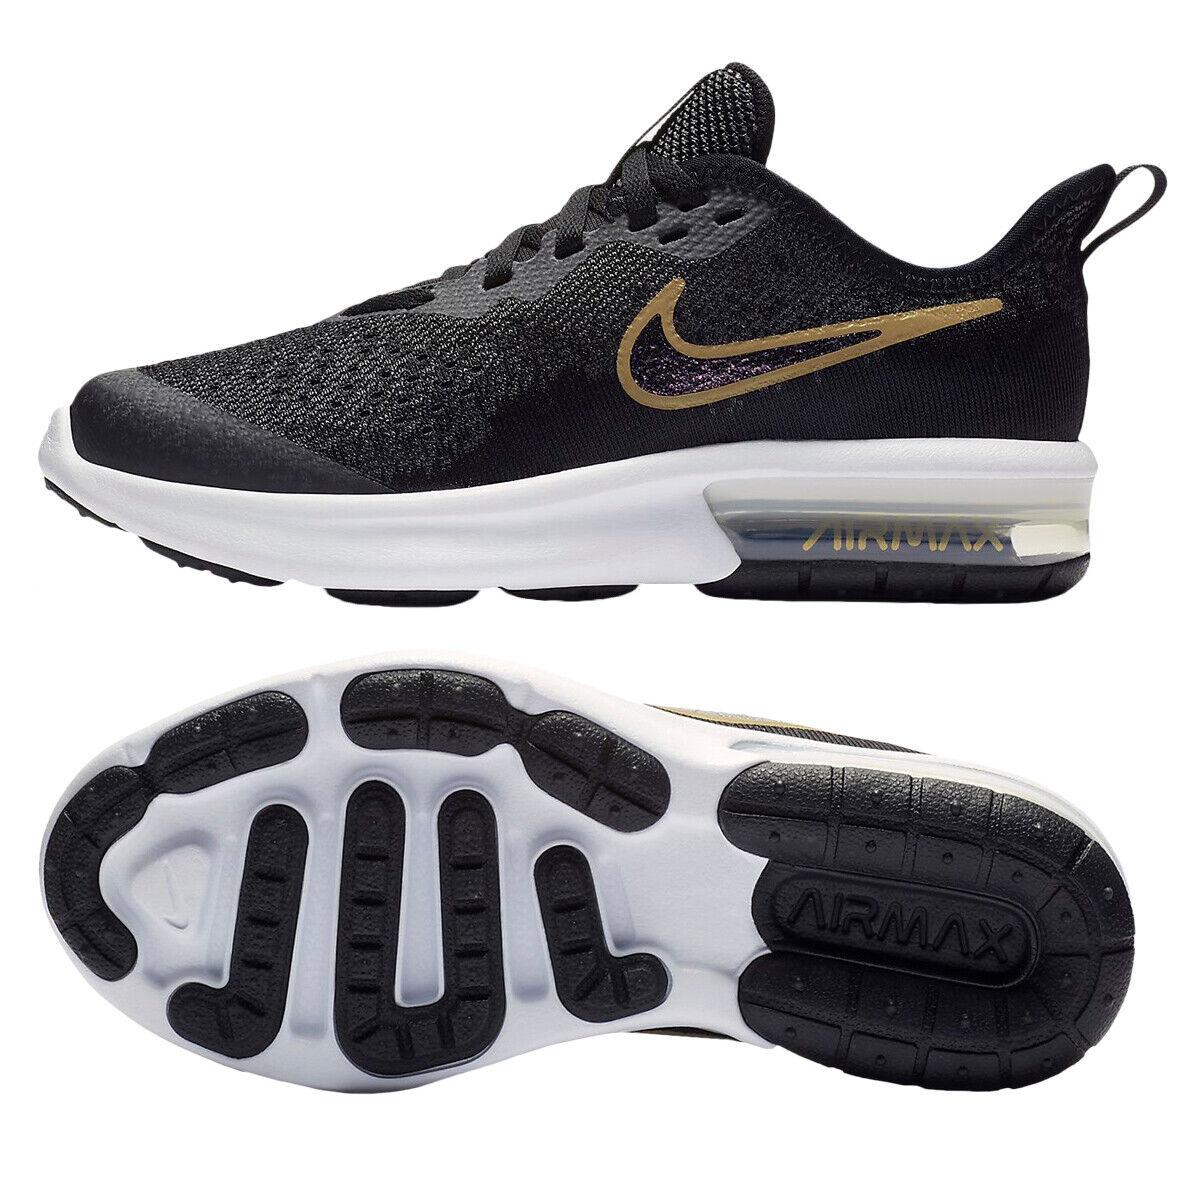 Turnschuhe Nike Running Test Vergleich +++ Turnschuhe Nike